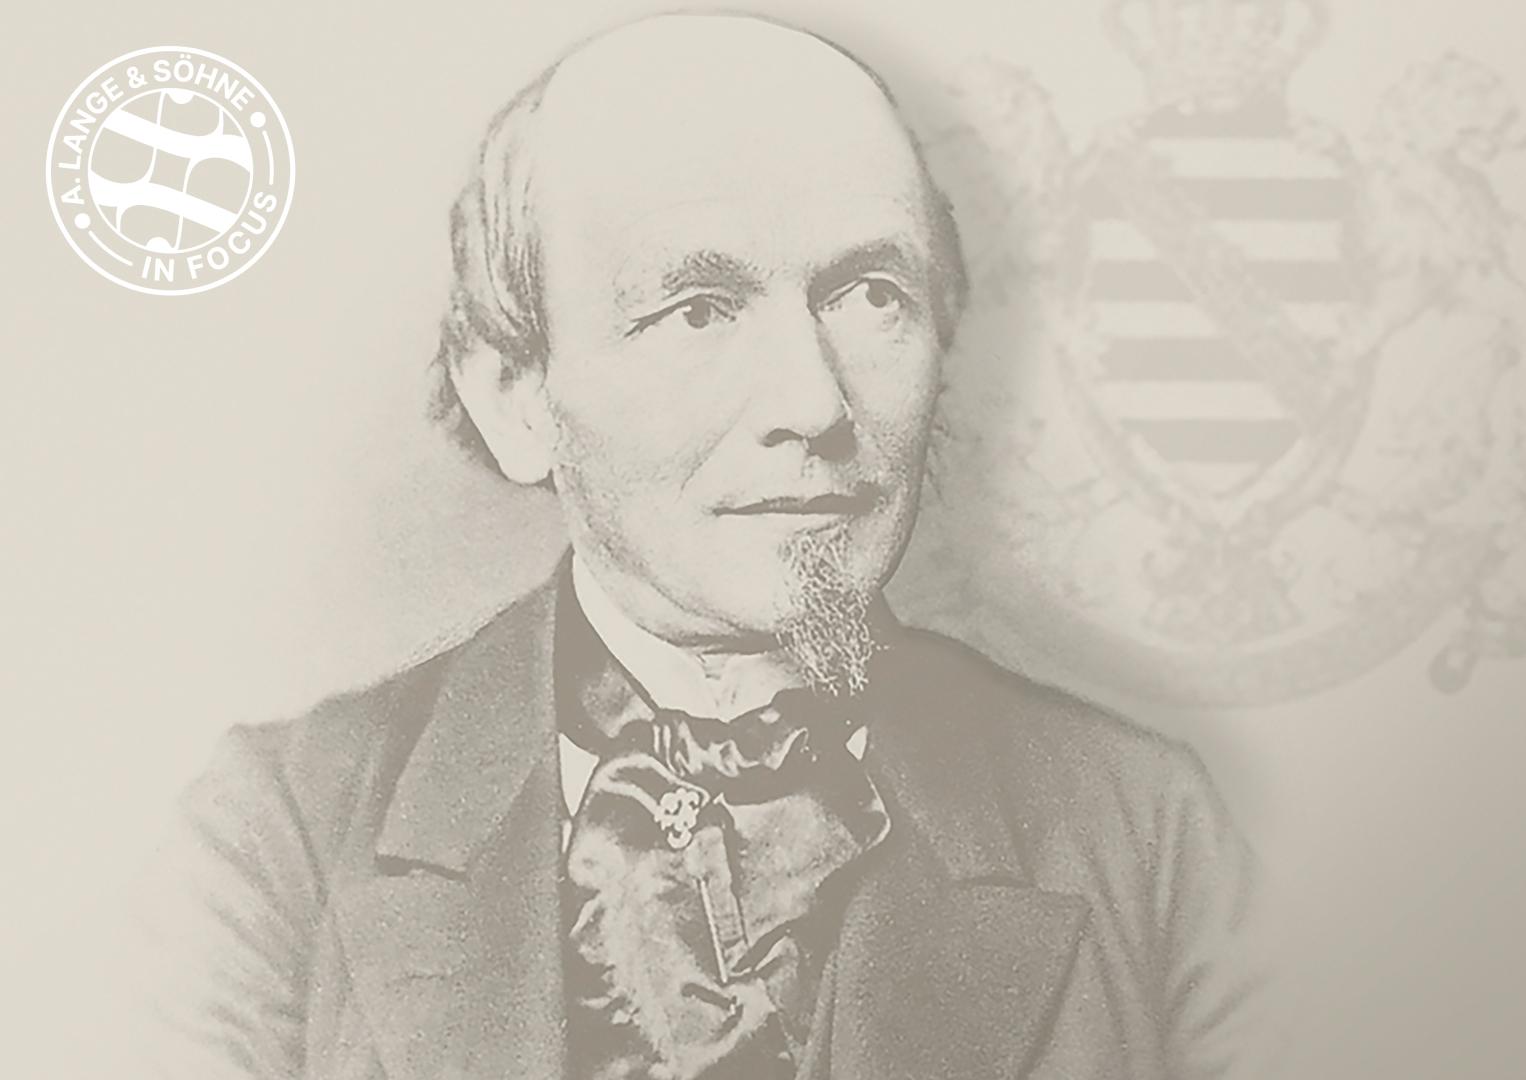 Ferdinand Adolph Lange, founder of A. Lange & Söhne